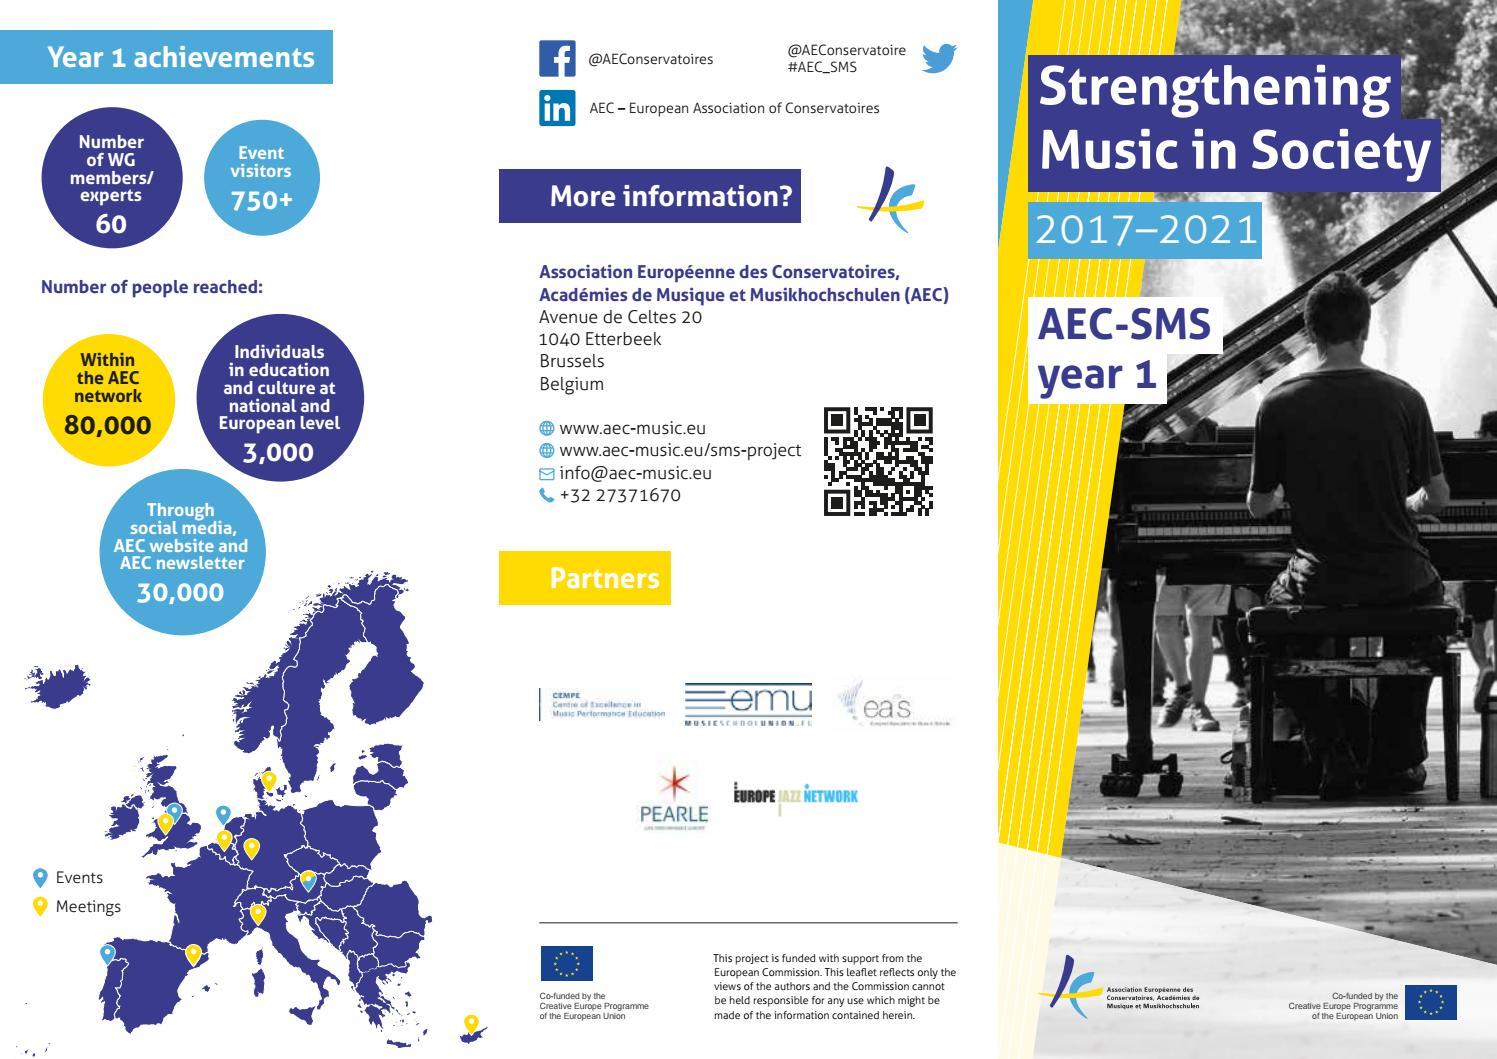 AEC-SMS year 1 Flyer by AEC - Association Européenne des